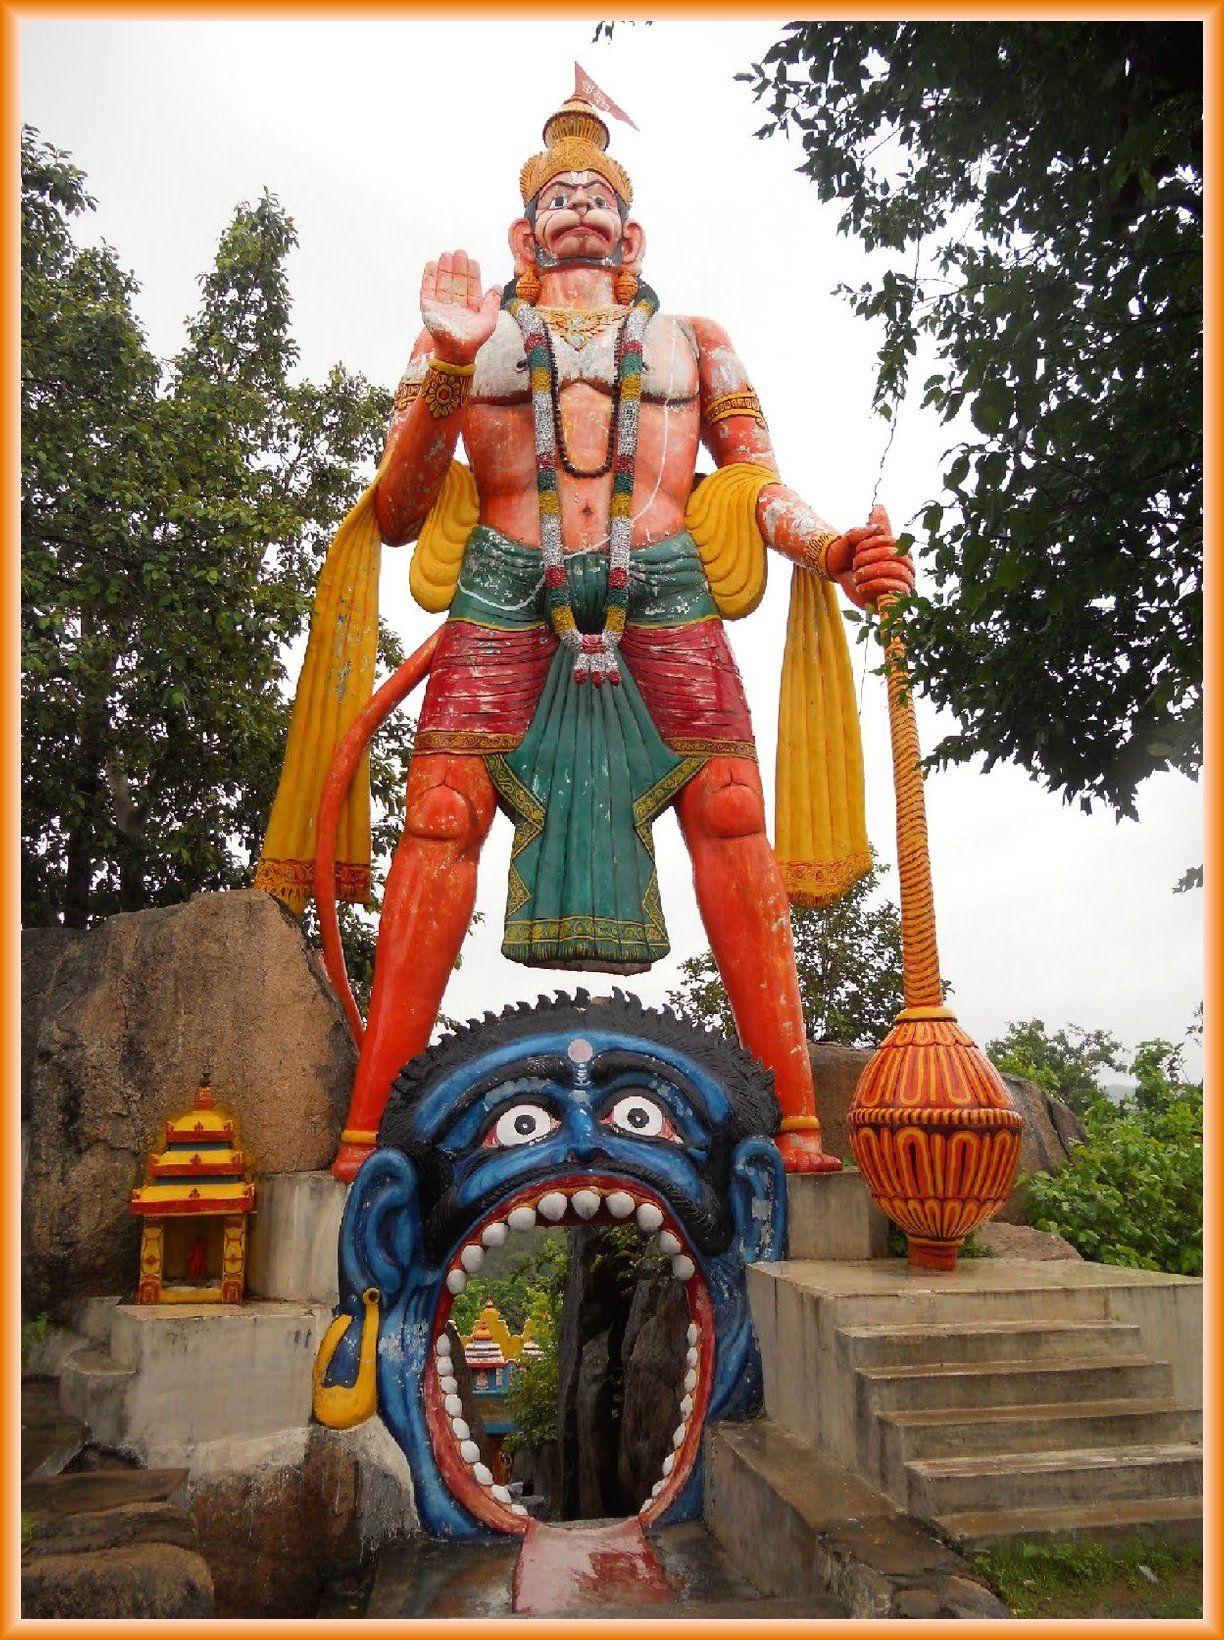 Scarlet Colour Tallest Sculpture Of Lord Kapiraaj Hanuman At Lord